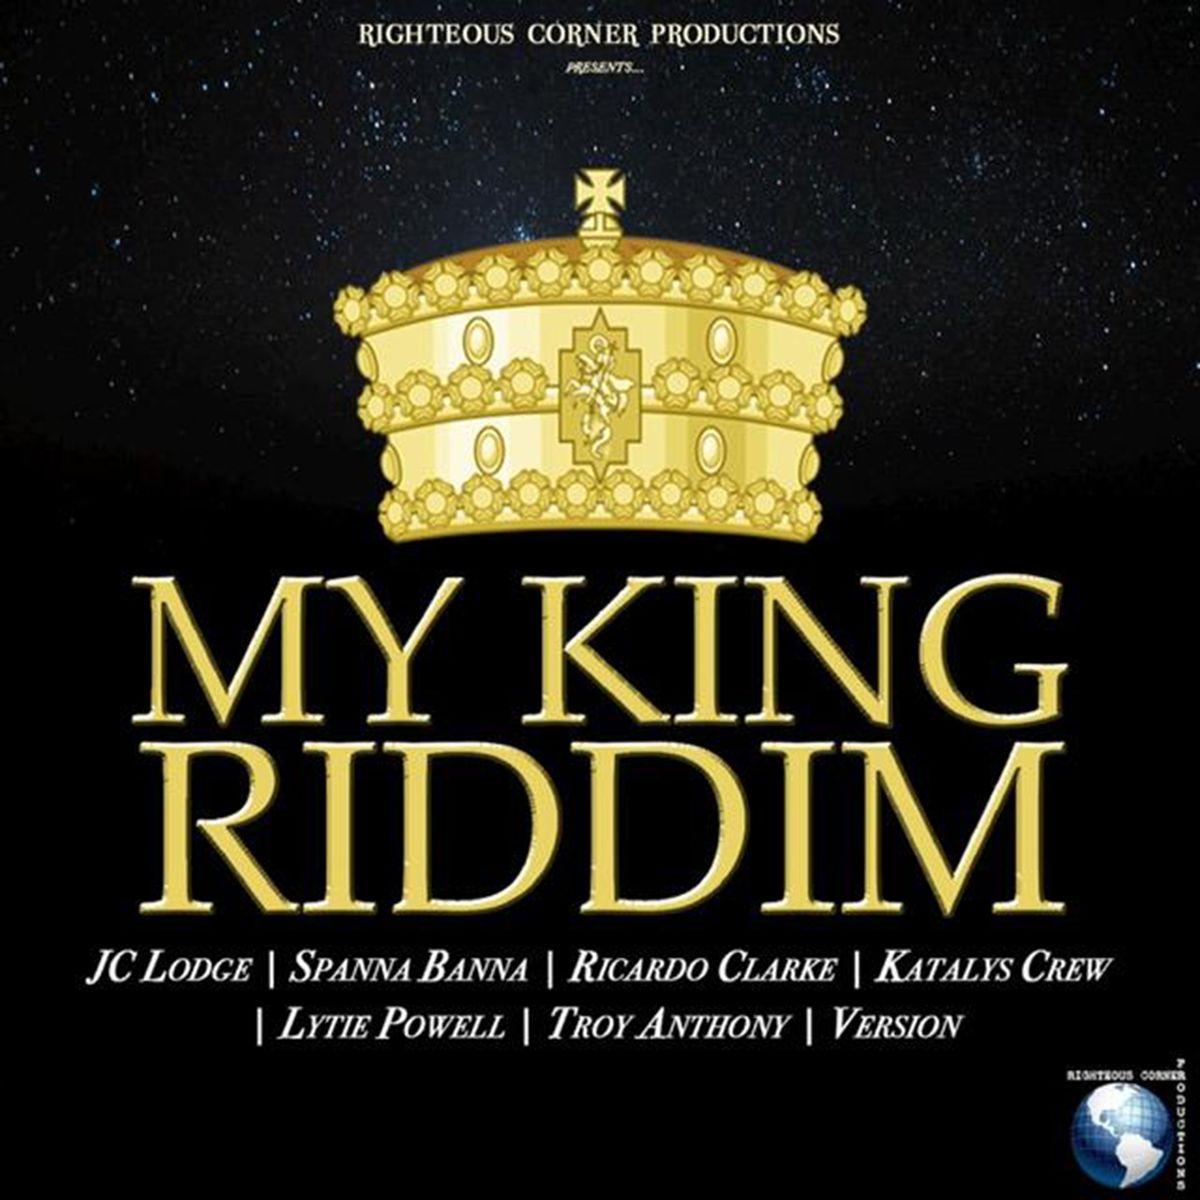 MY KING RIDDIM (REGGAE) - RIGHTEOUS CORNER PRODUCTIONS - 2018